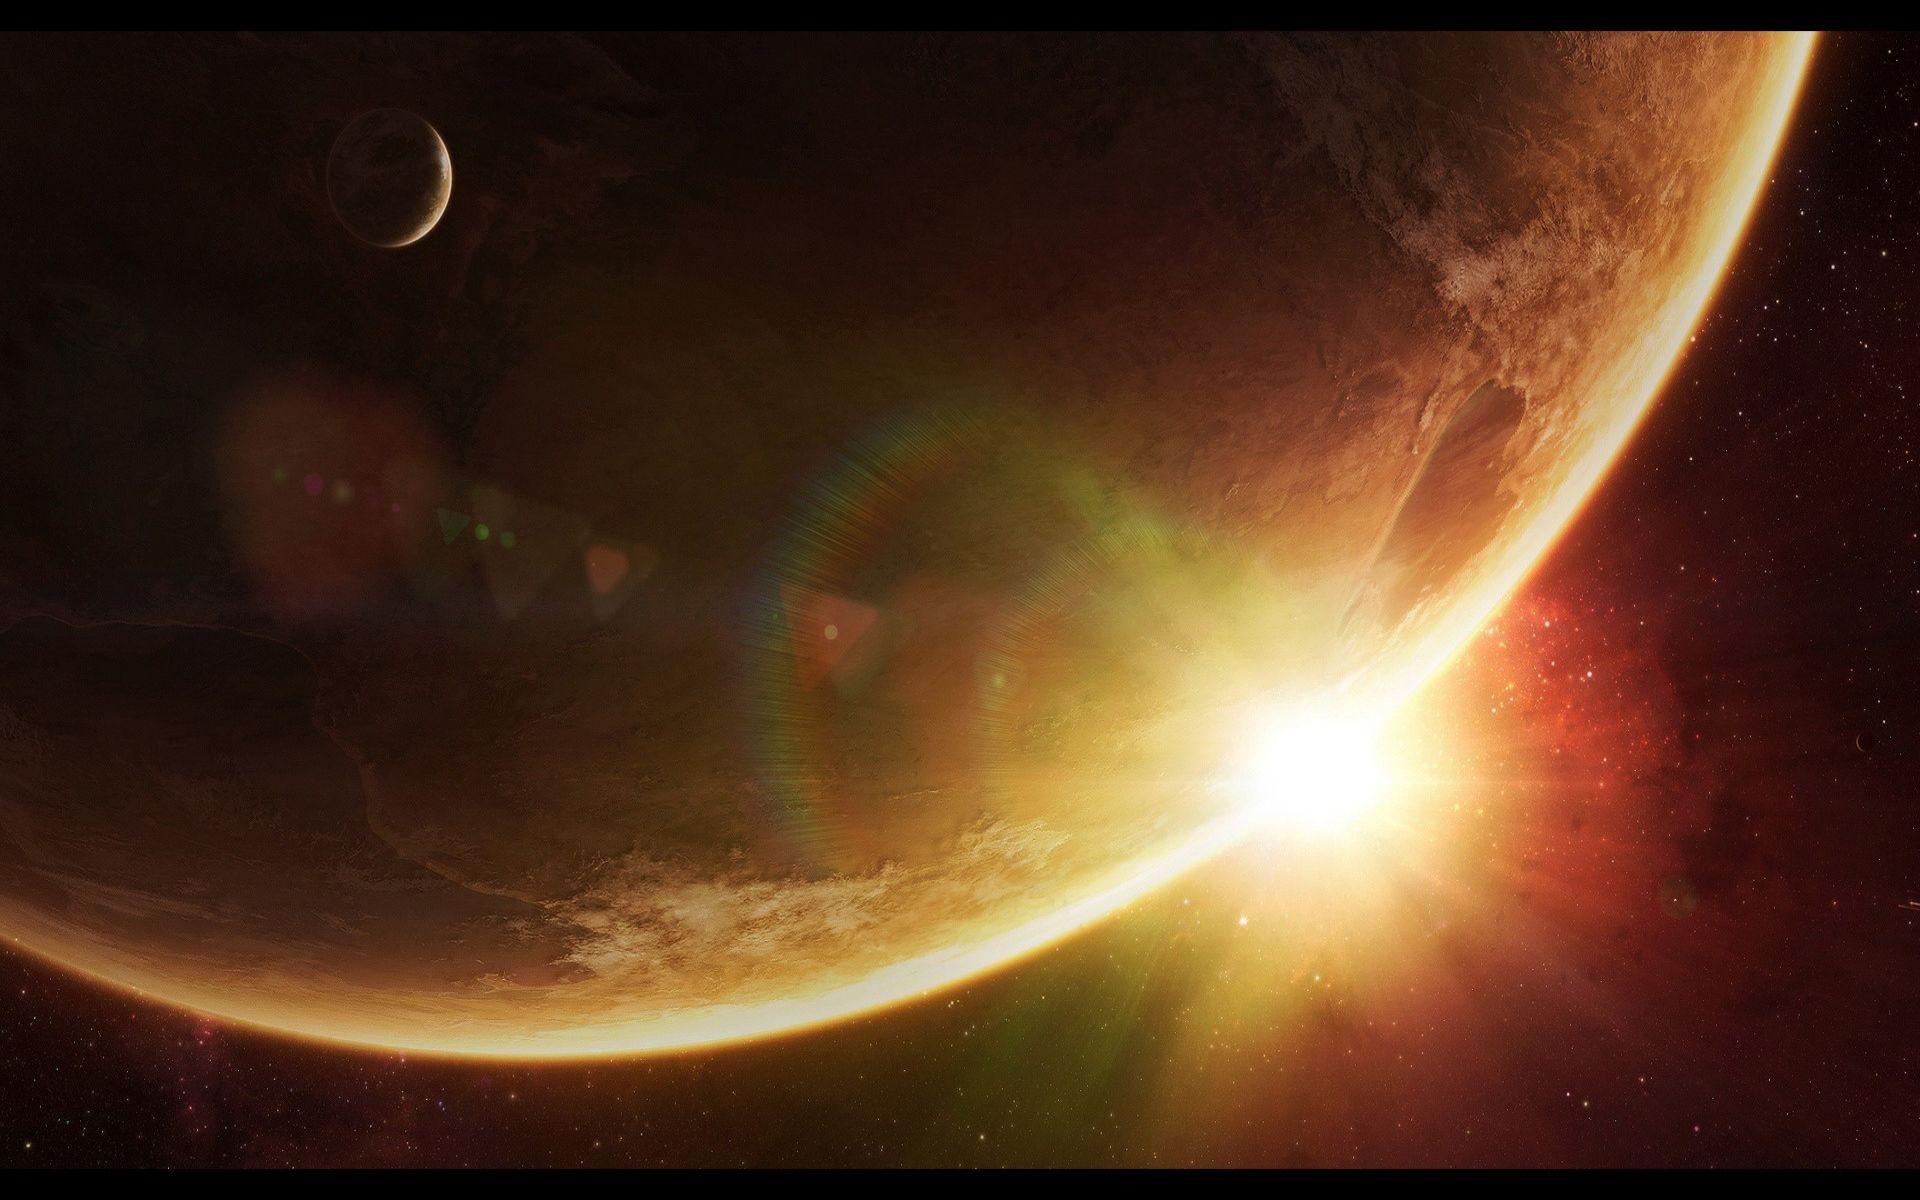 free-wonderful-space-sun-wallpaper_1920x1200_84536